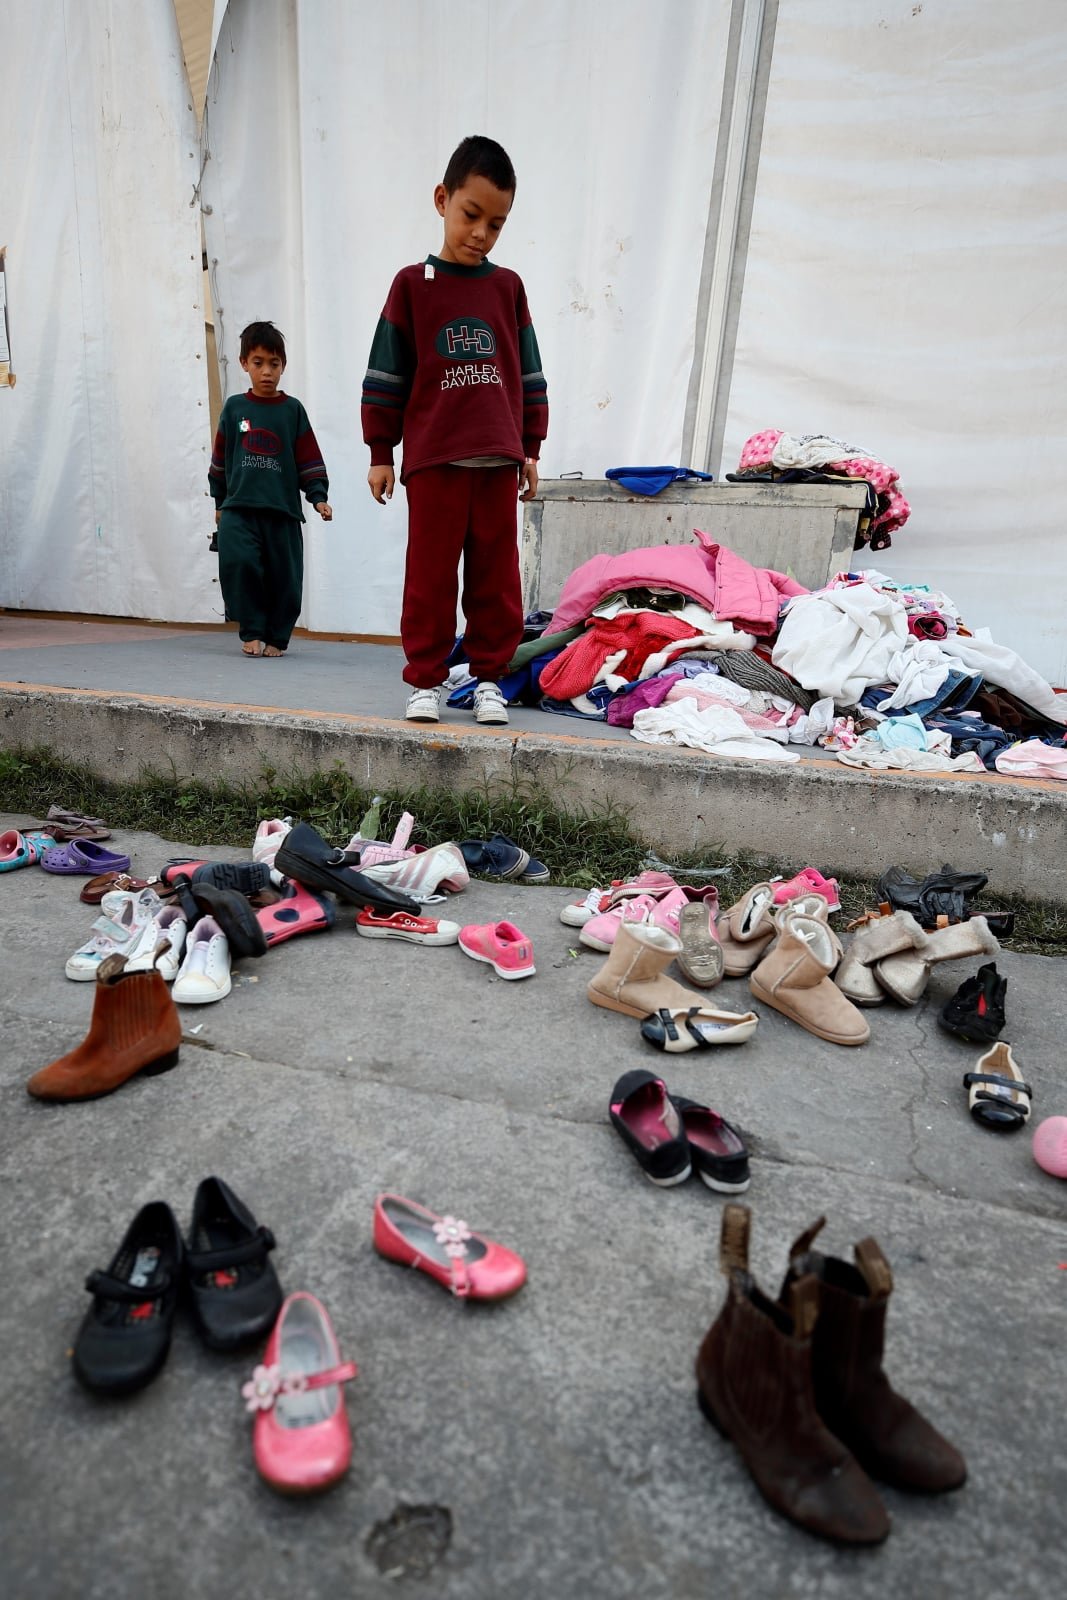 Uchodźcy w Mexico City fot. EPA/Jose Mendez